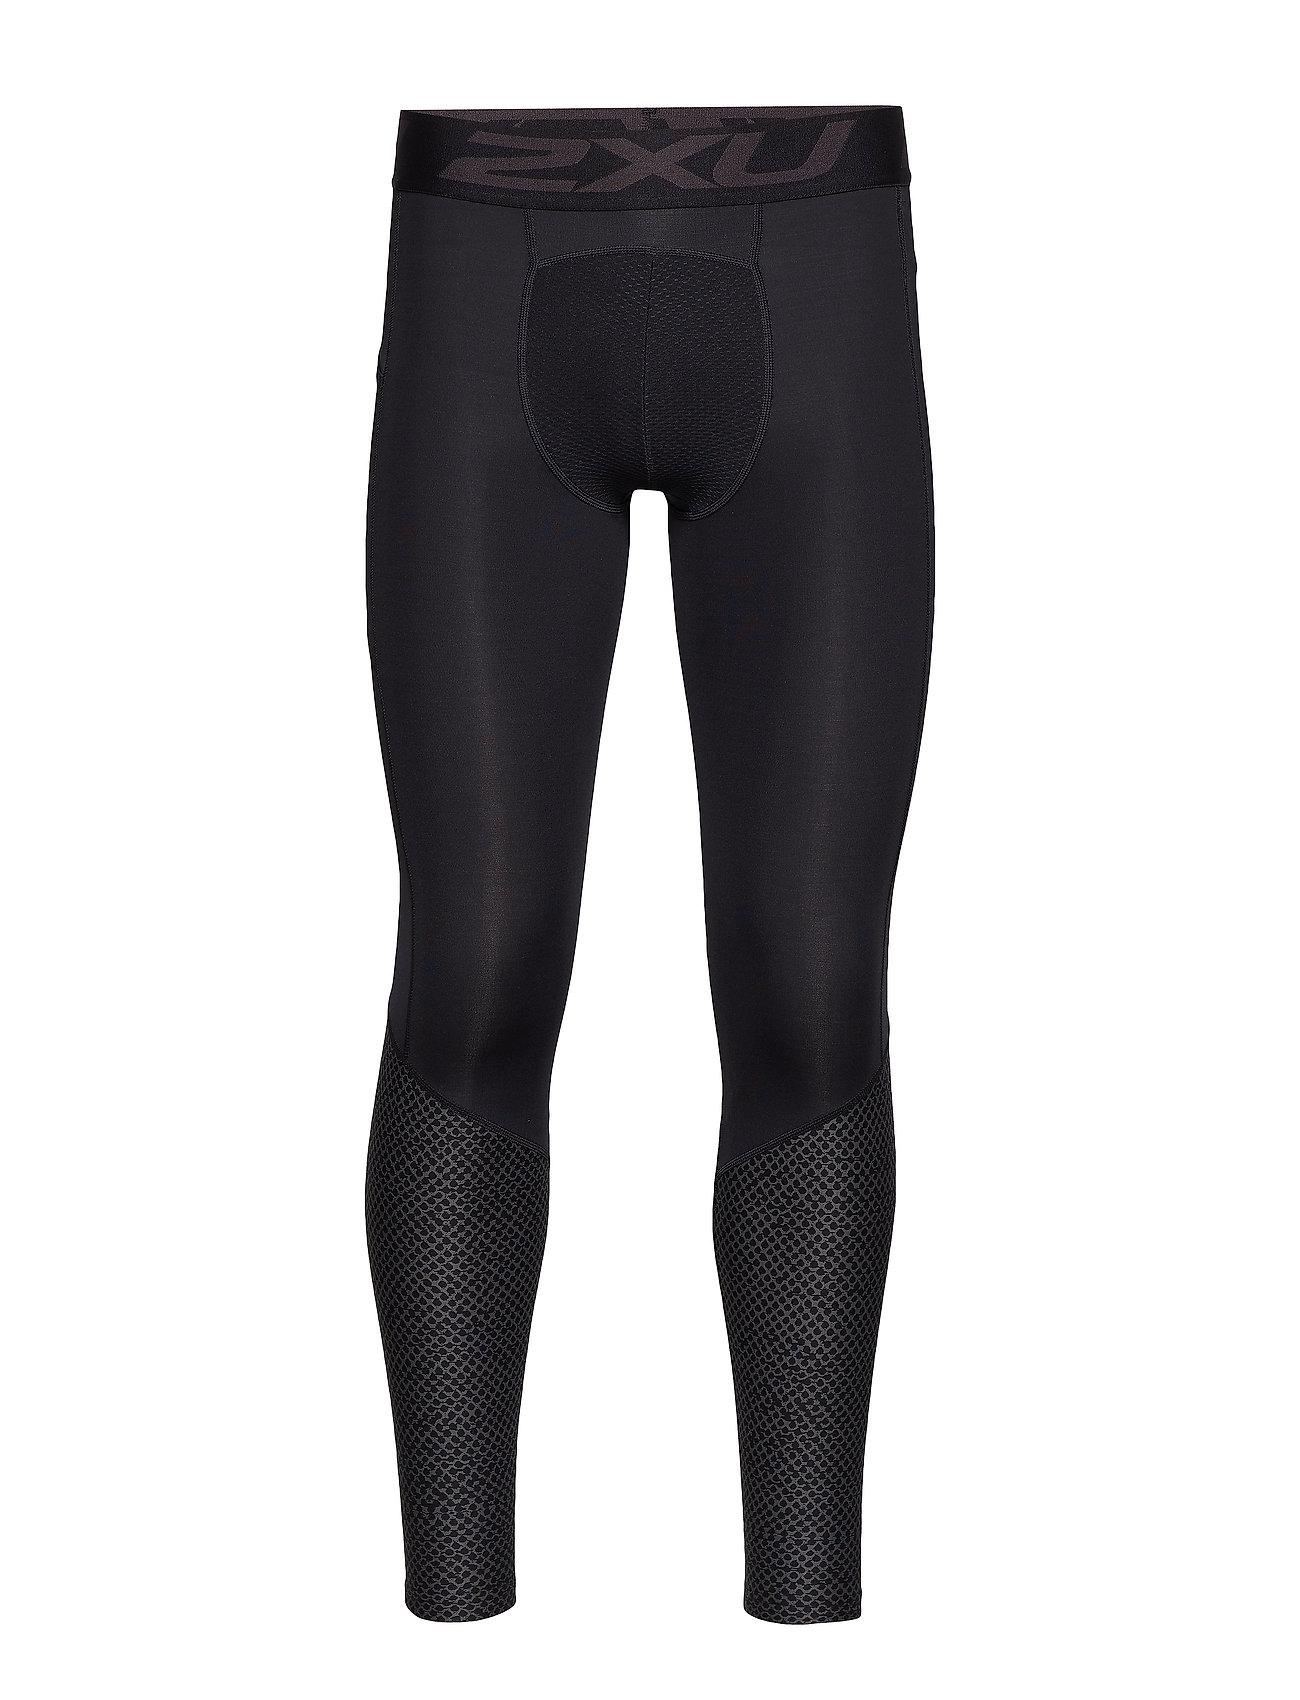 2XU Accel Comp Tight w Storage M Tights & shorts